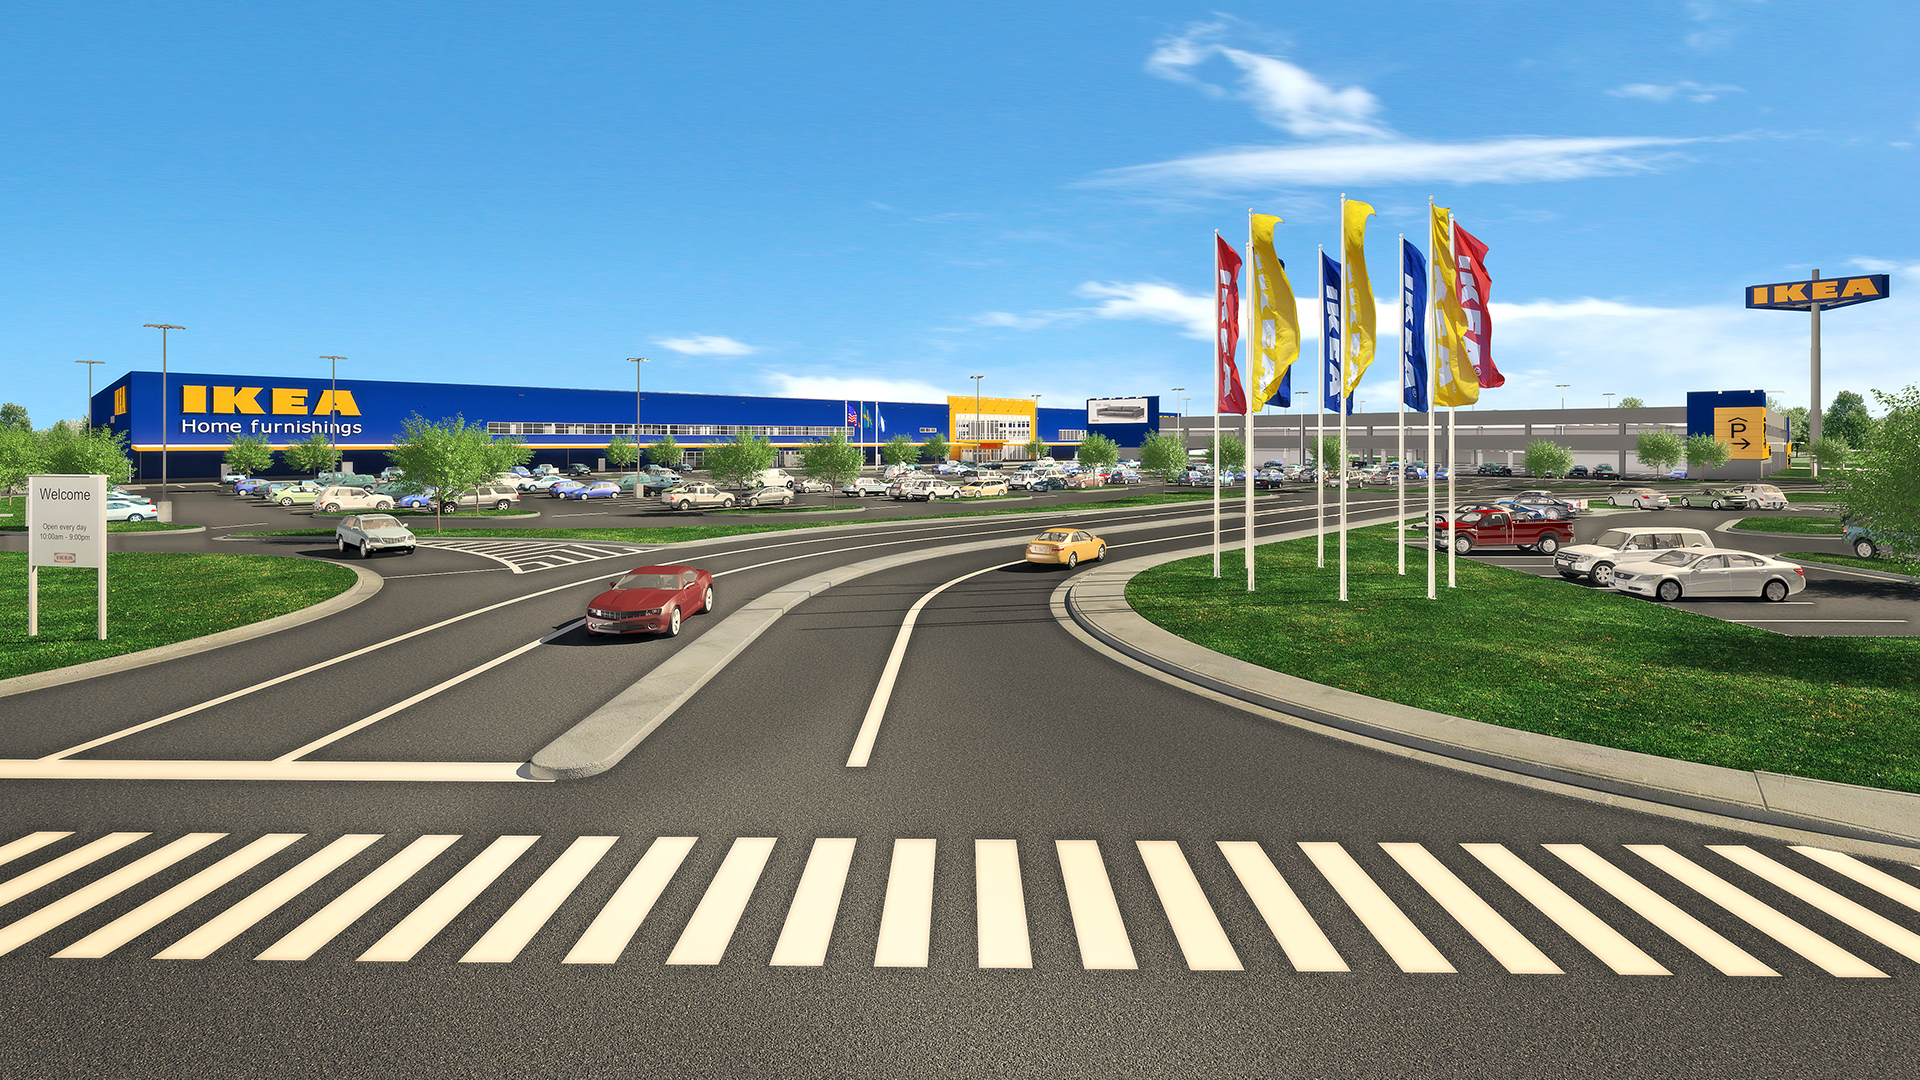 Swedish Home Furnishings Retailer Ikea Secures Contractors